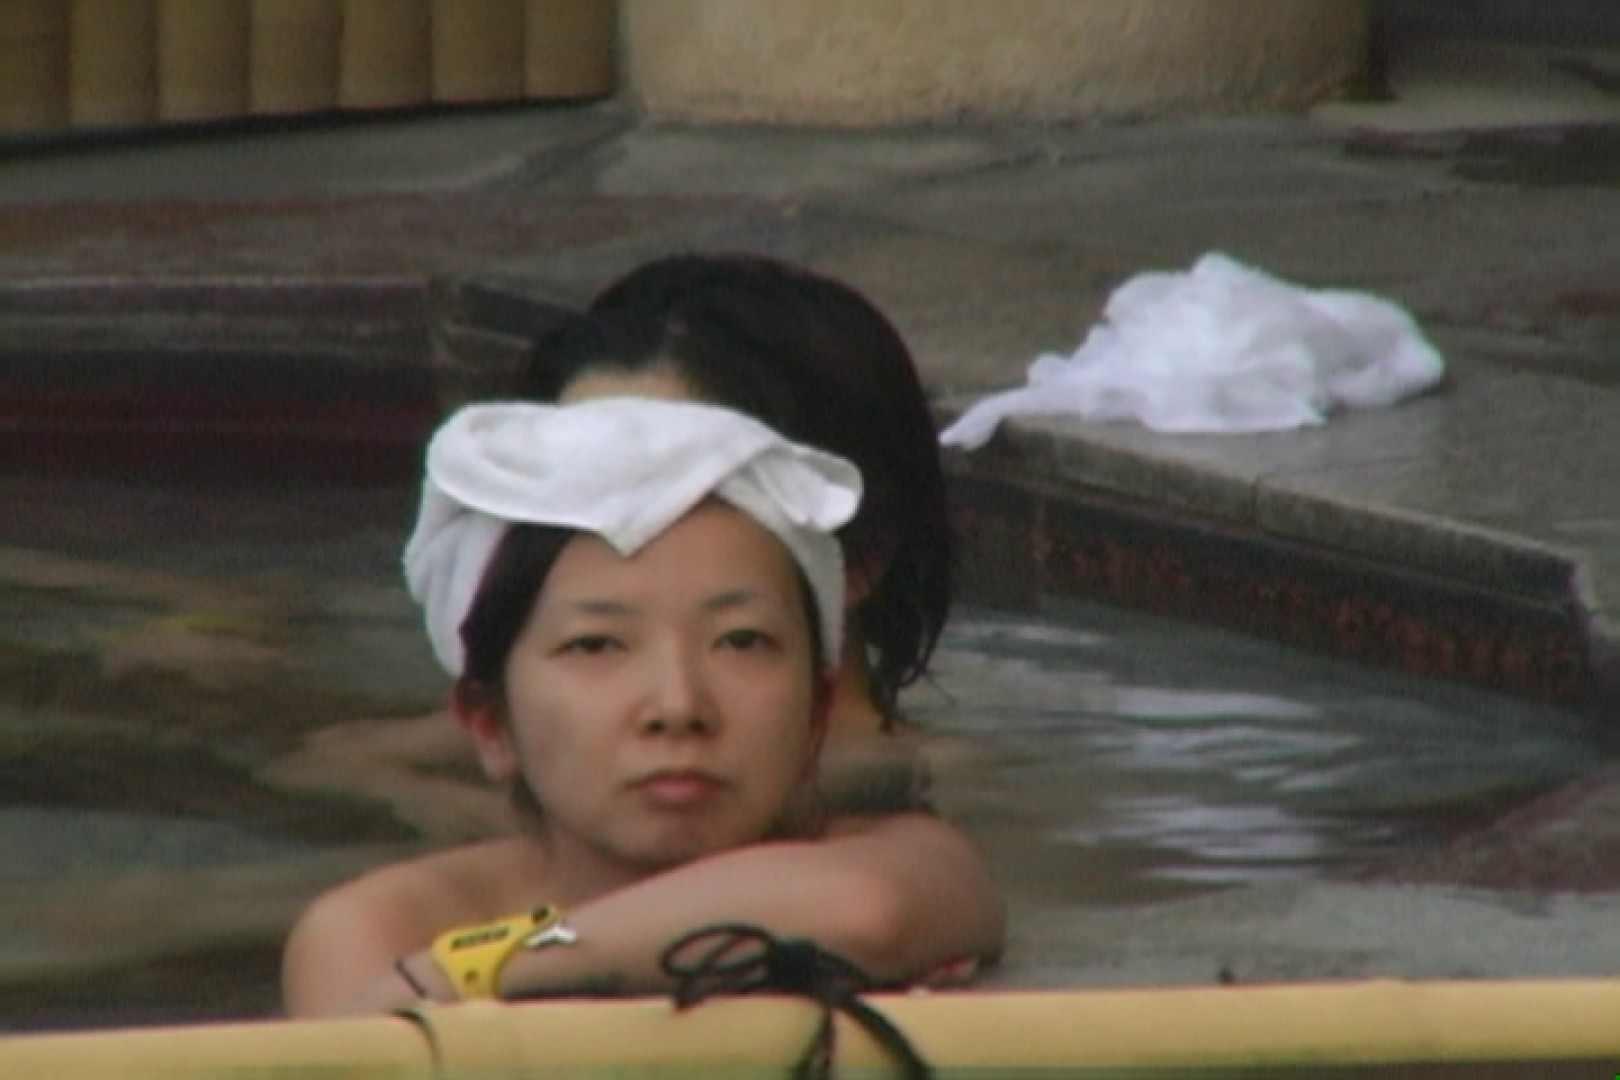 Aquaな露天風呂Vol.613 OL女体   露天  43連発 1